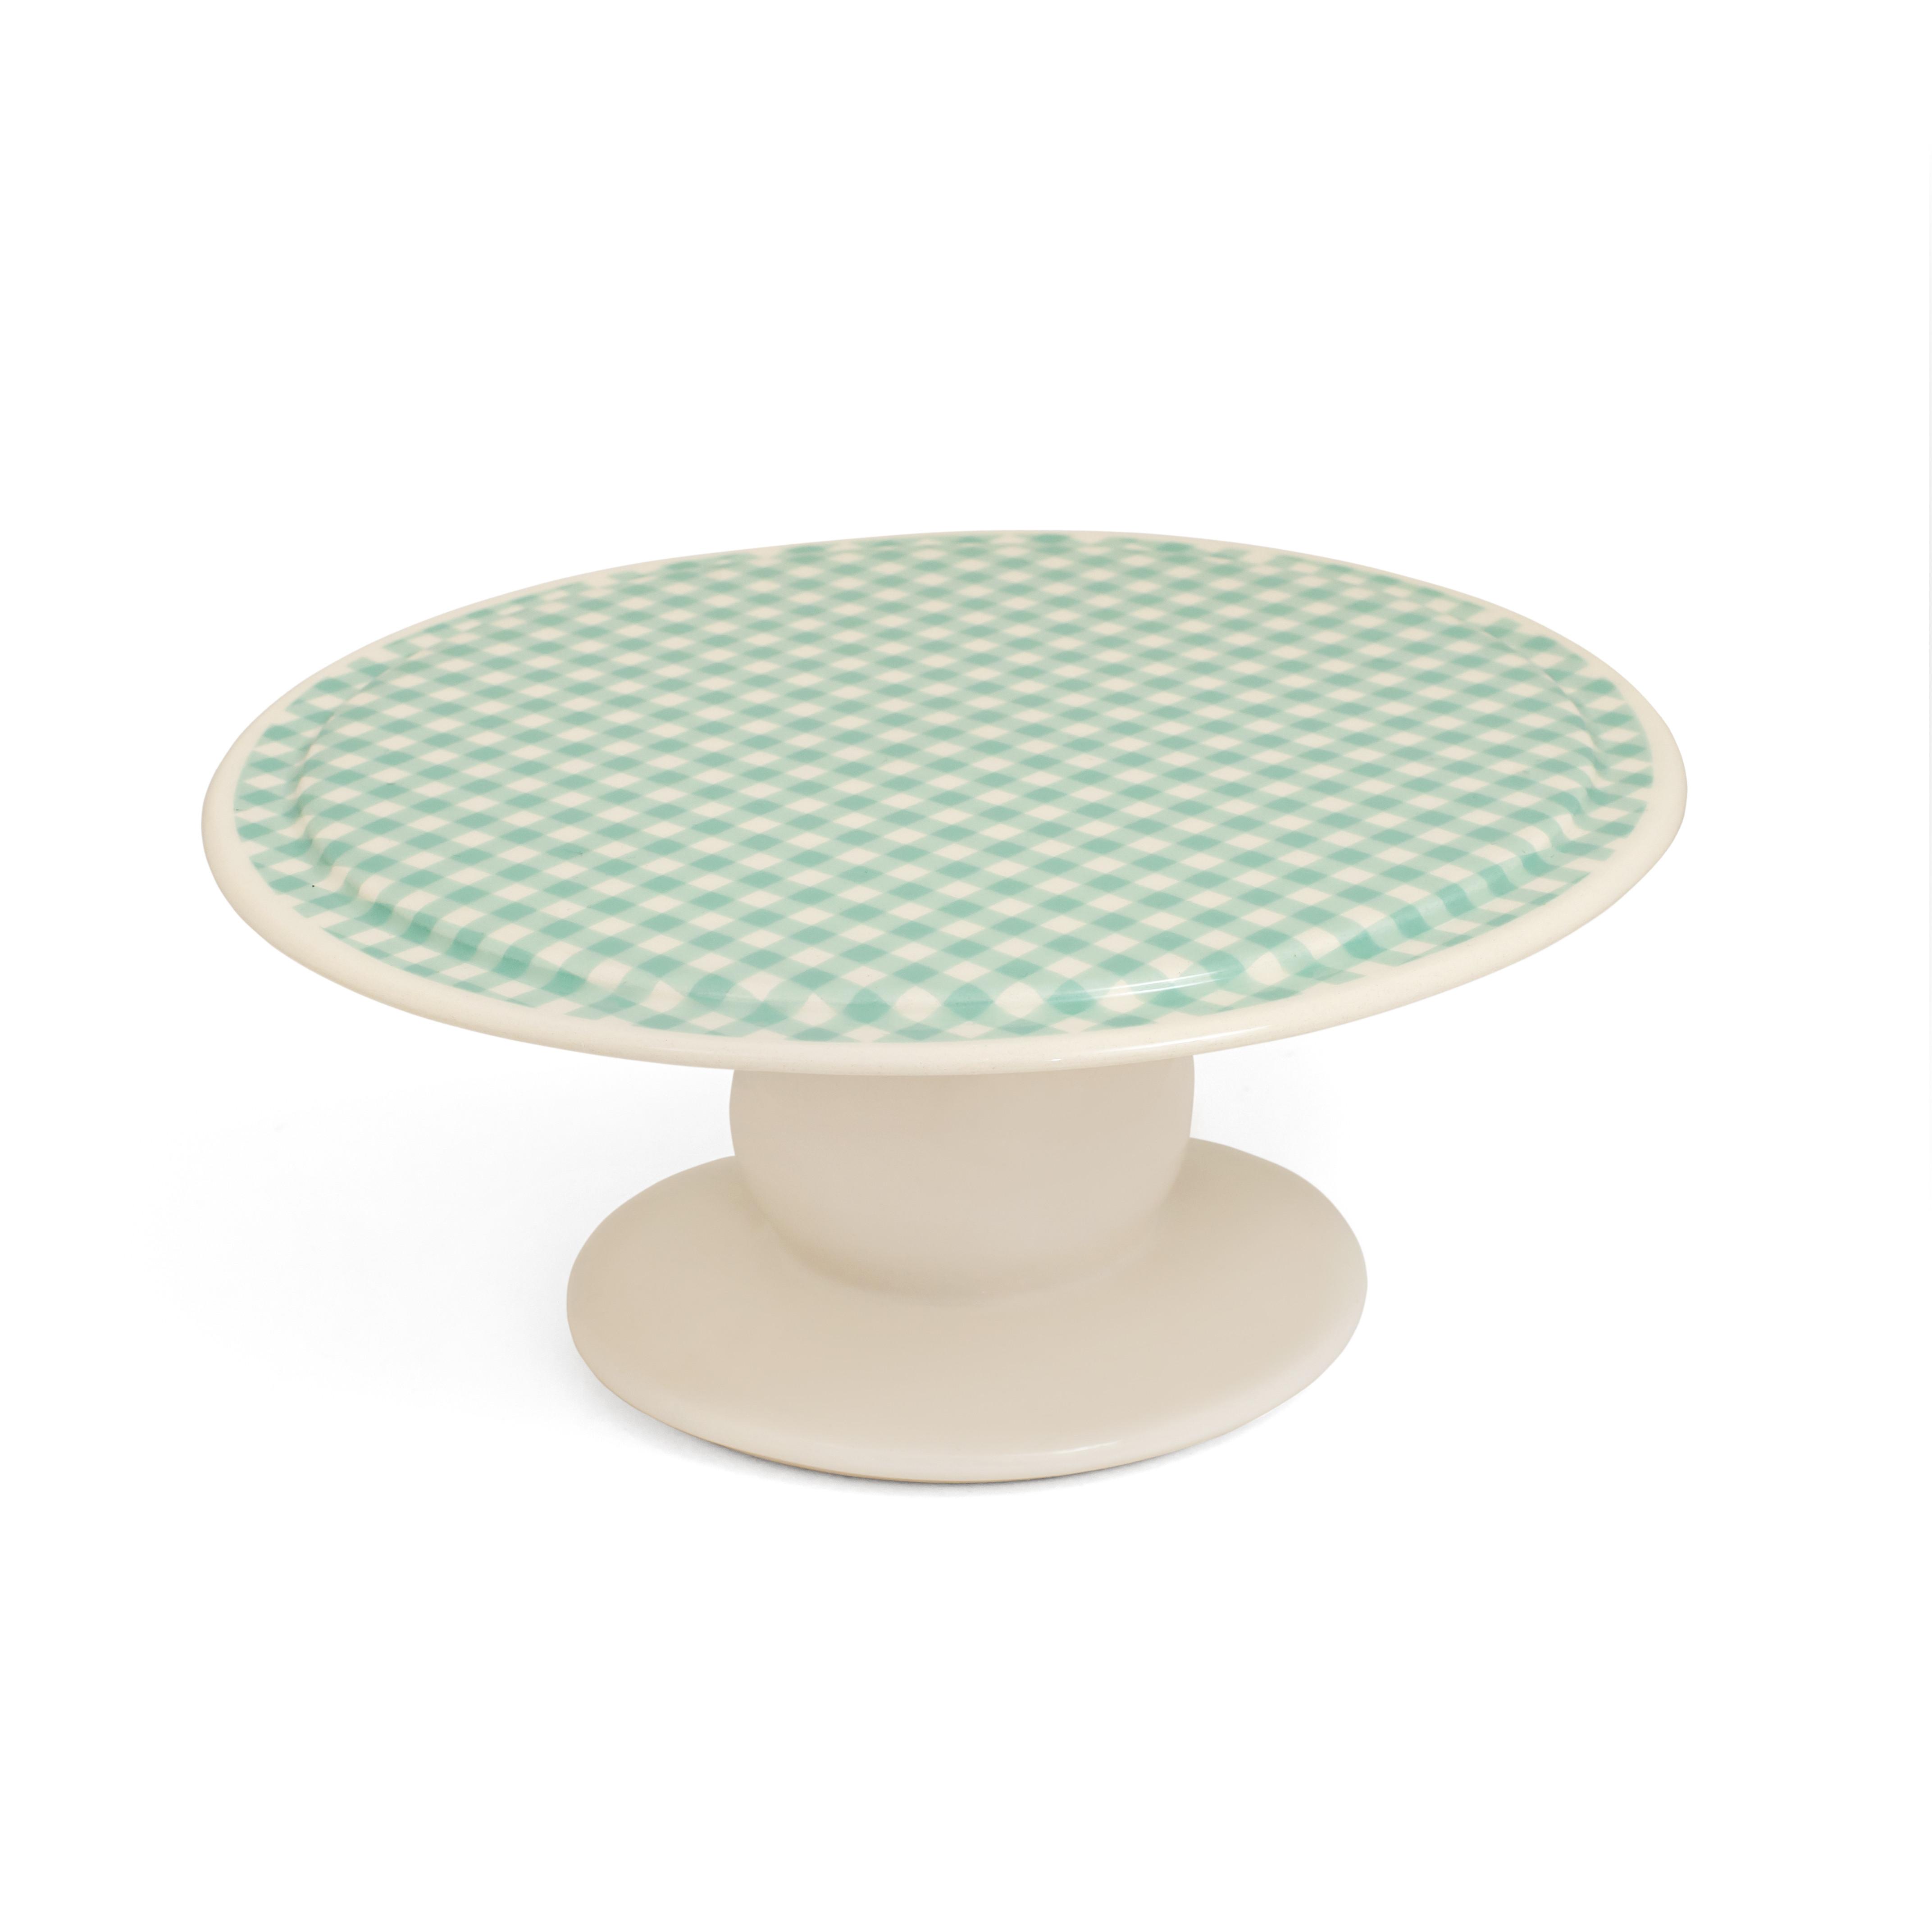 Nigella Lawson Cake Stand